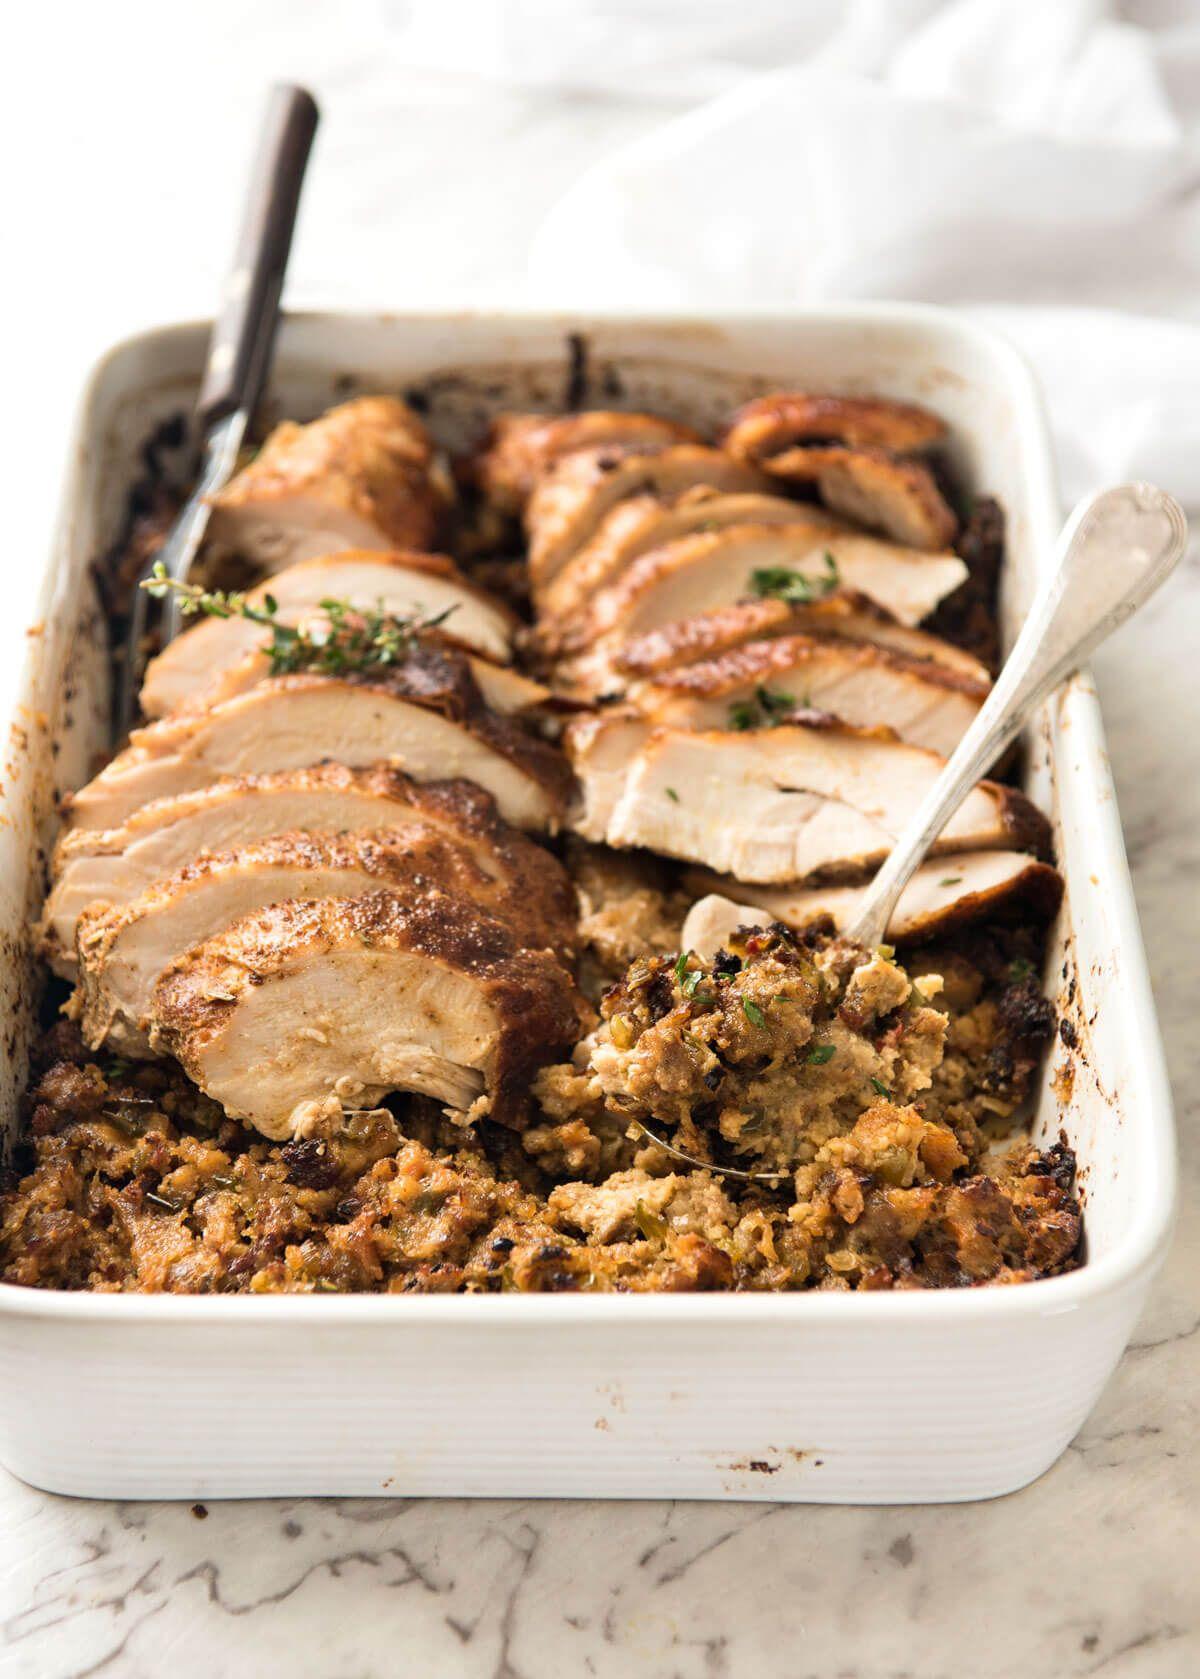 Brined and stuffed turkey breast